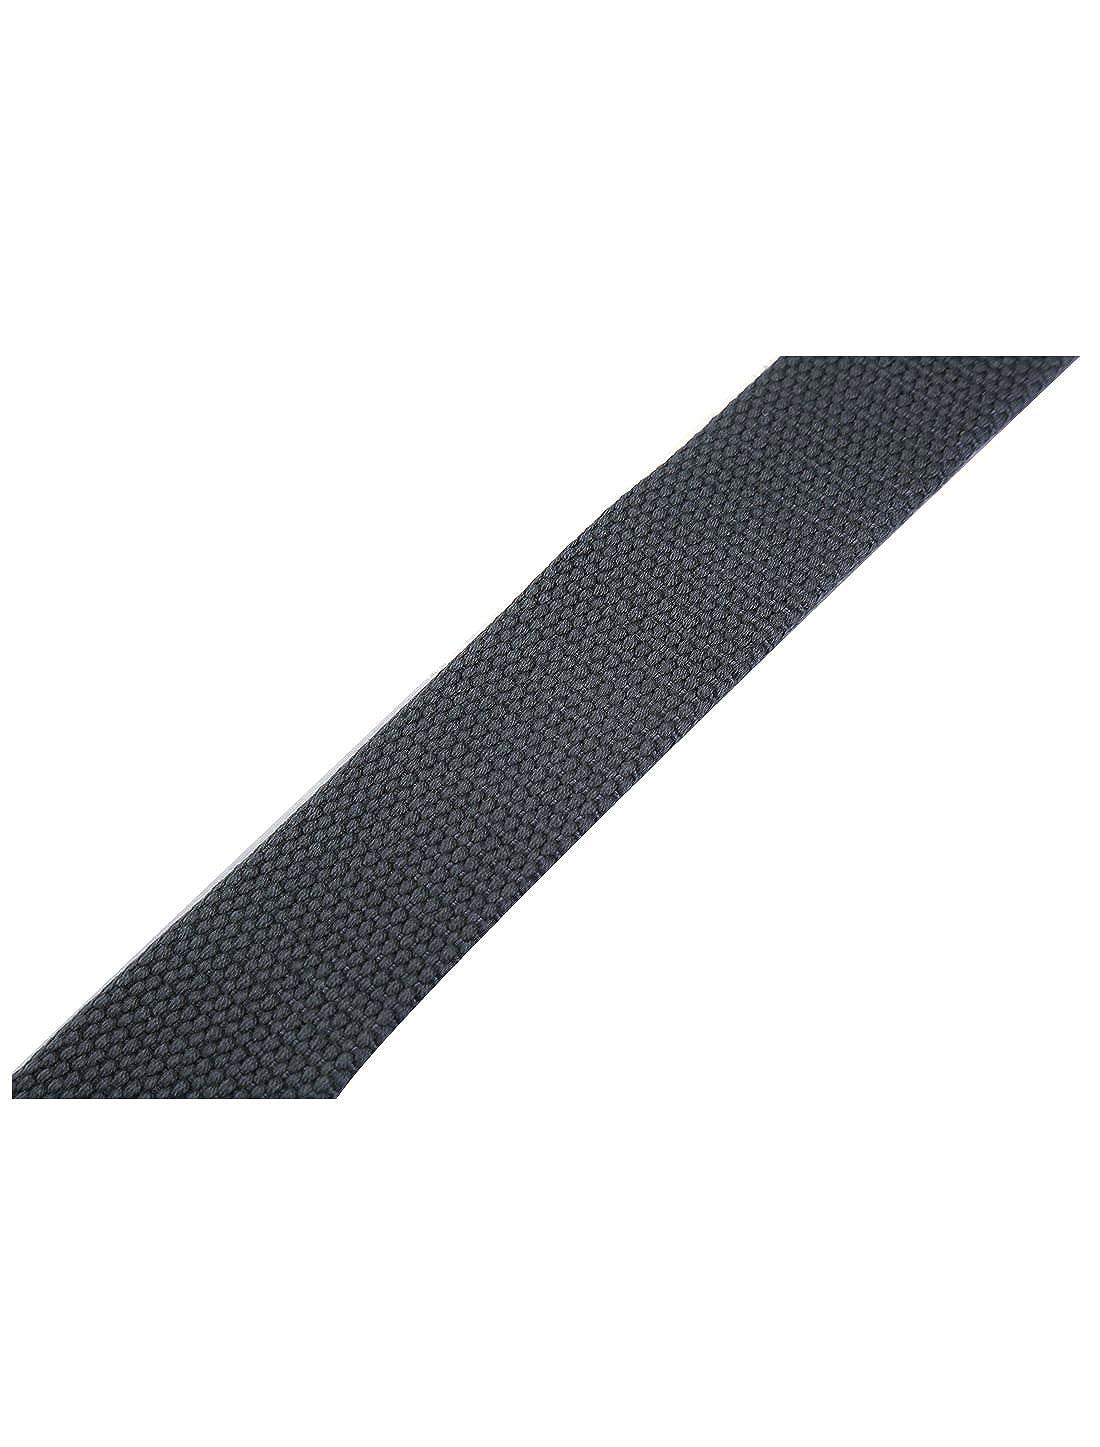 uxcell Unisex Canvas No Hole PU Panel Slide Buckle Belt 1 1//2